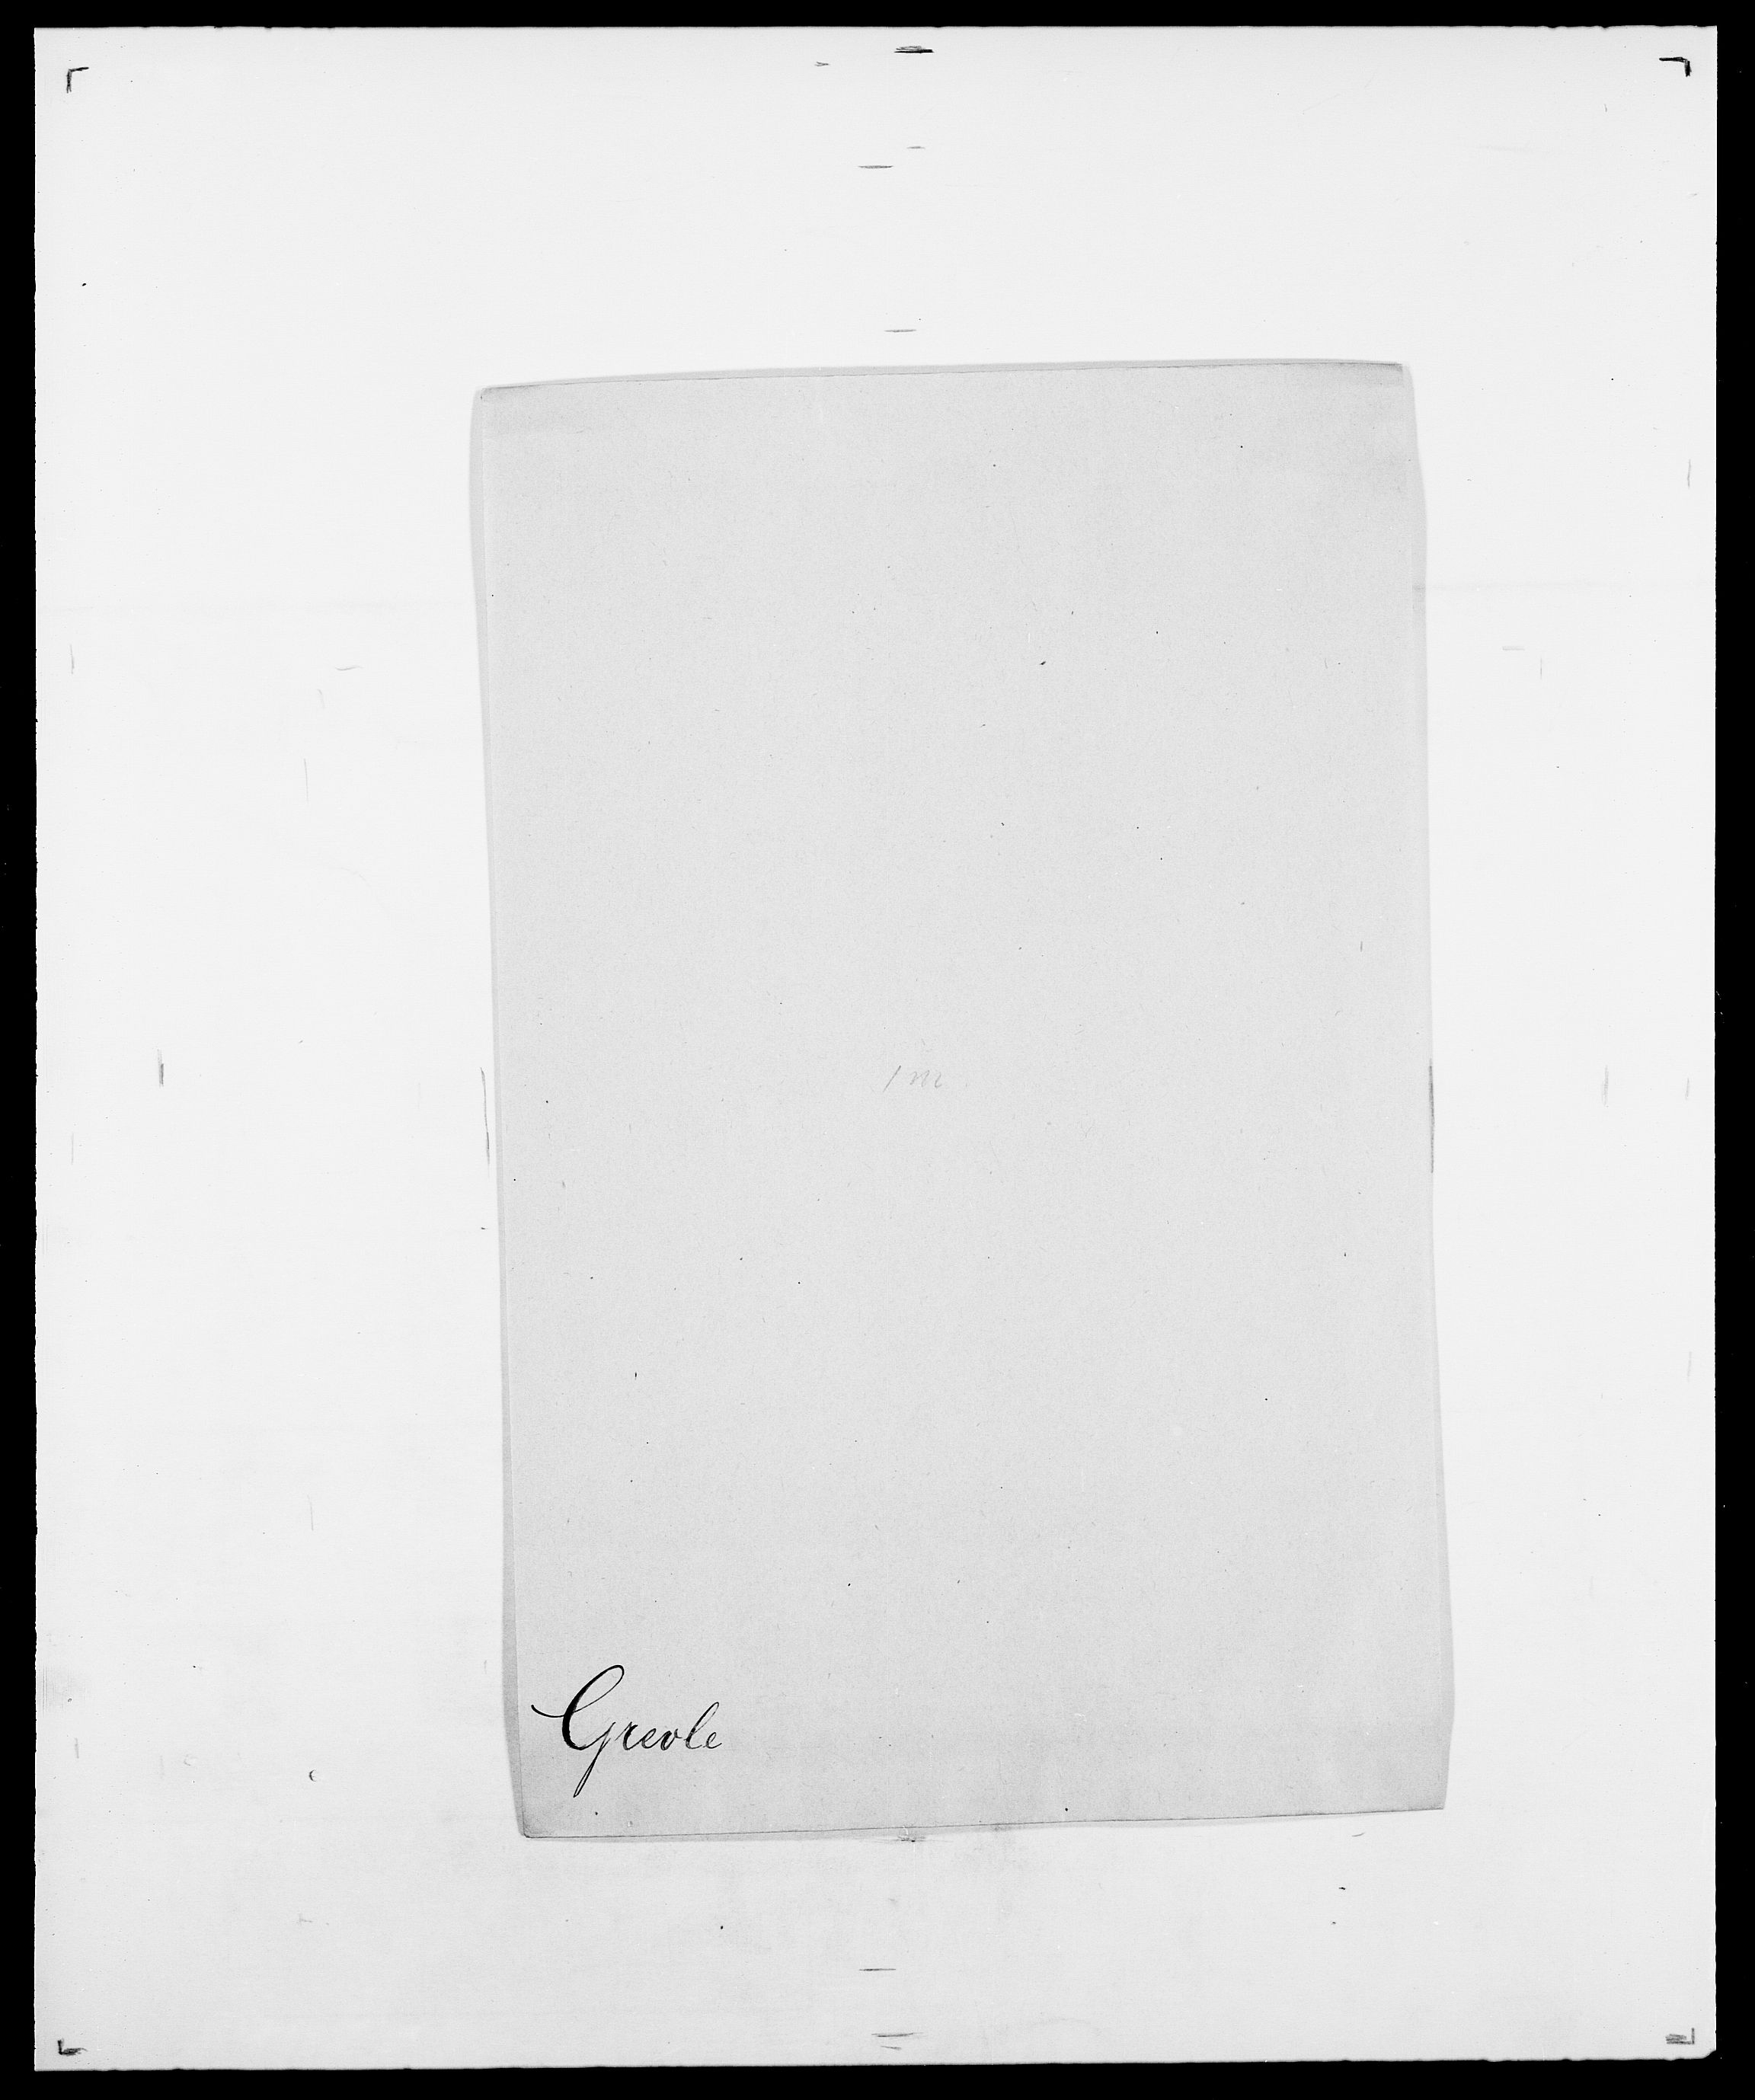 SAO, Delgobe, Charles Antoine - samling, D/Da/L0014: Giebdhausen - Grip, s. 637